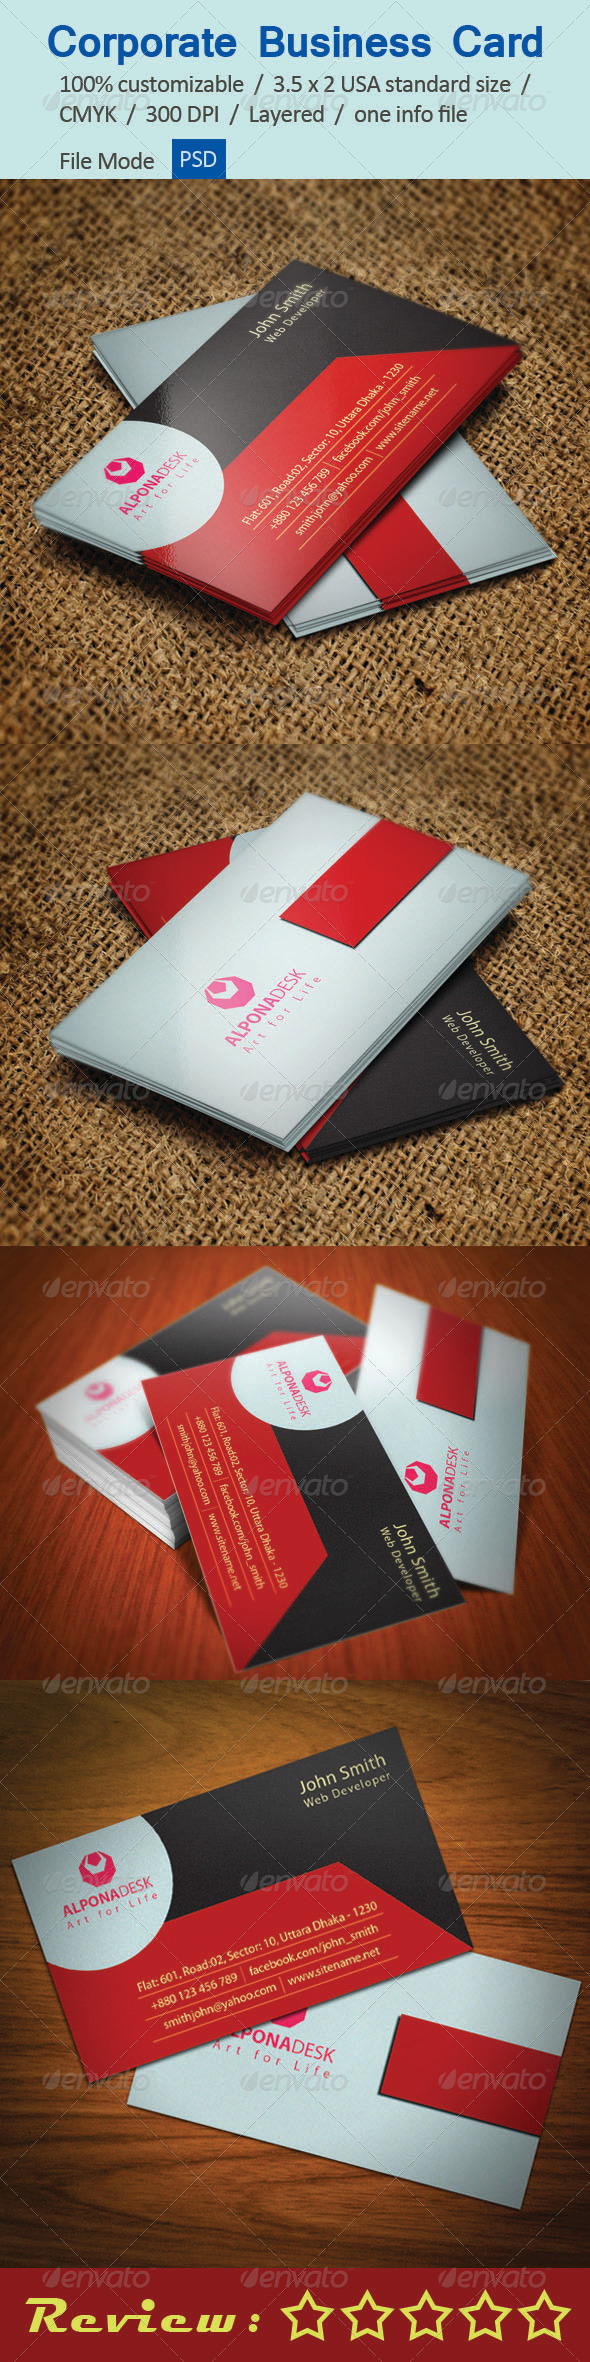 GraphicRiver Corporate Business Card V-1 5422445